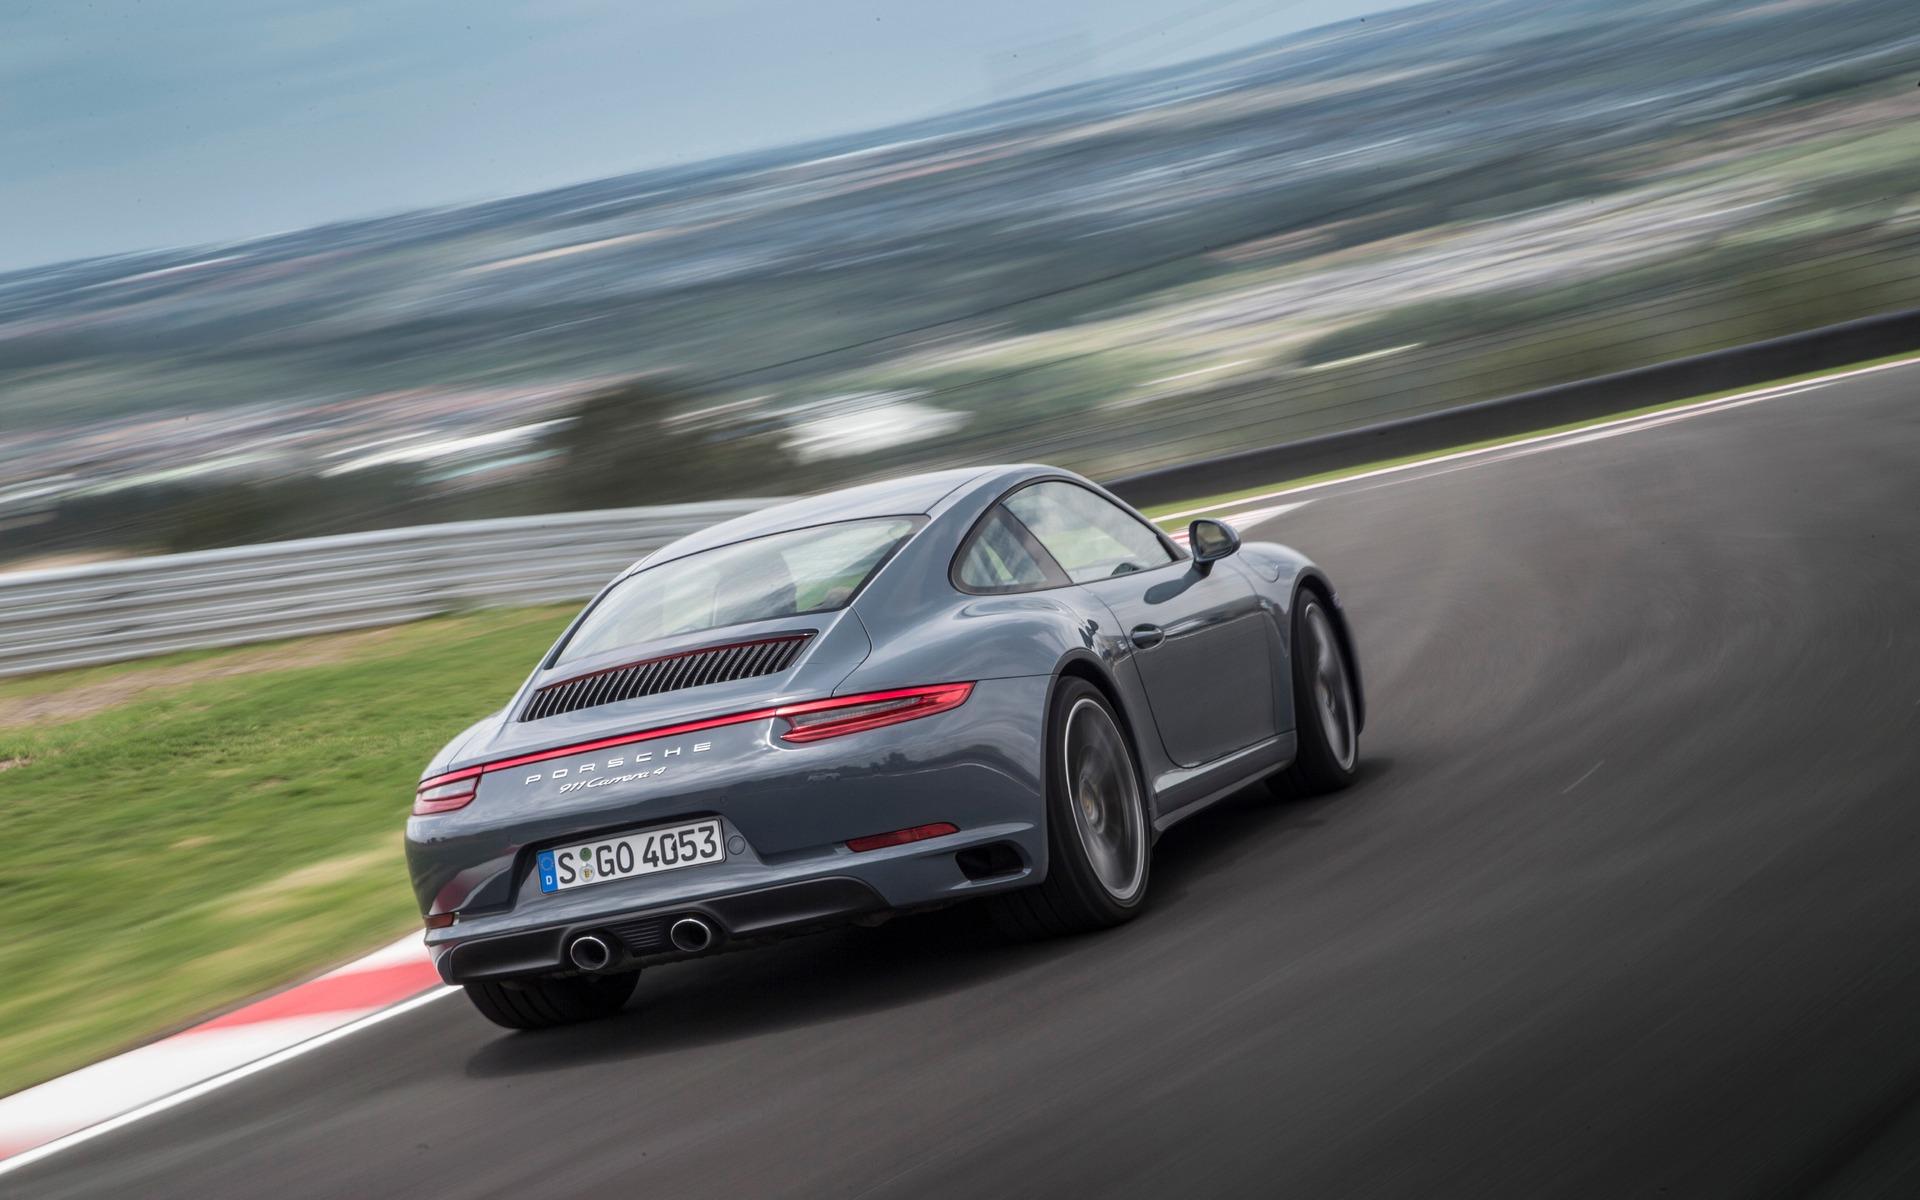 2017 porsche 911 carrera 4s, targa and turbo s: we're driving them